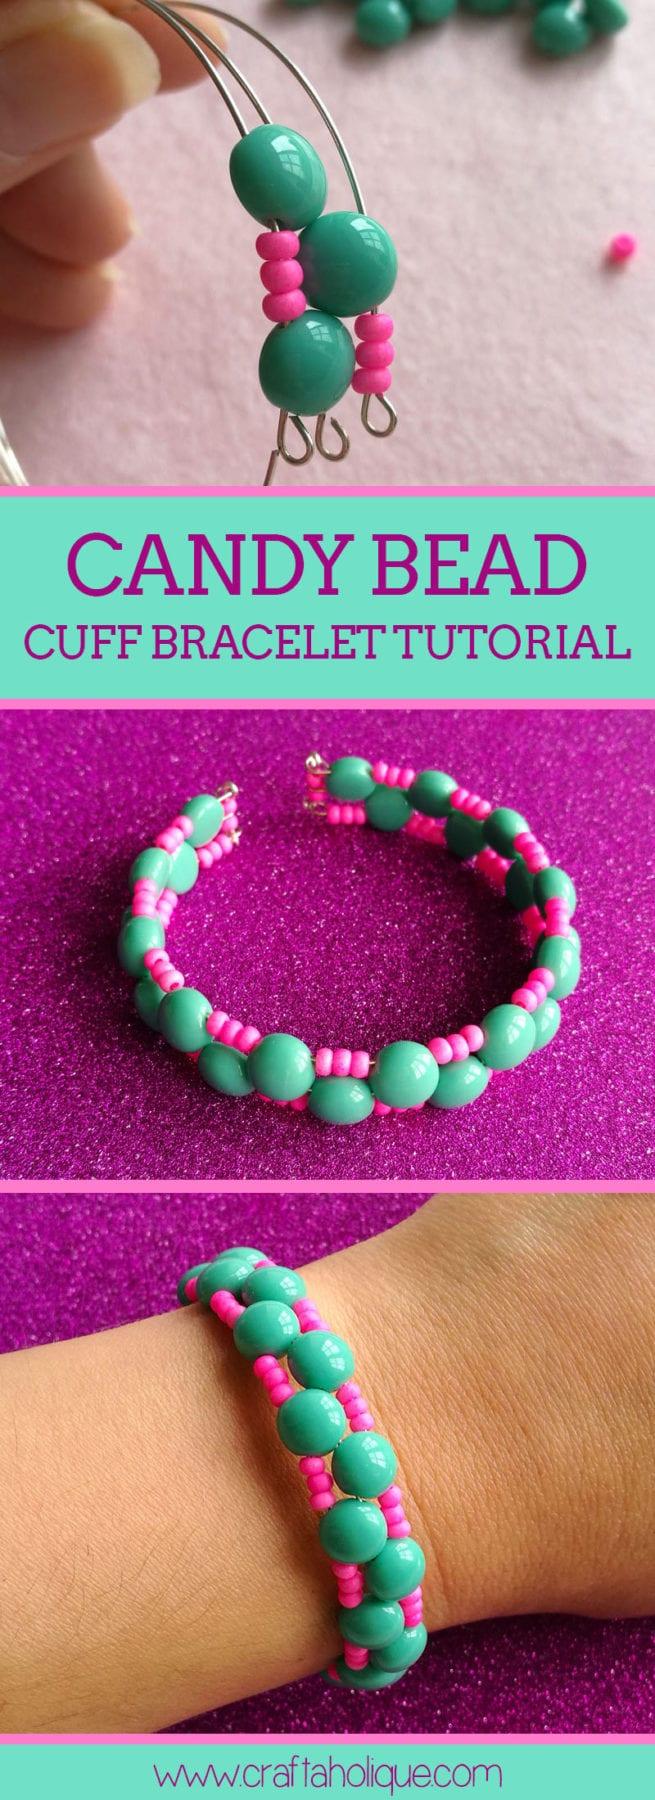 Candy Bead & Memory Wire Cuff Bracelet Tutorial | Craftaholique